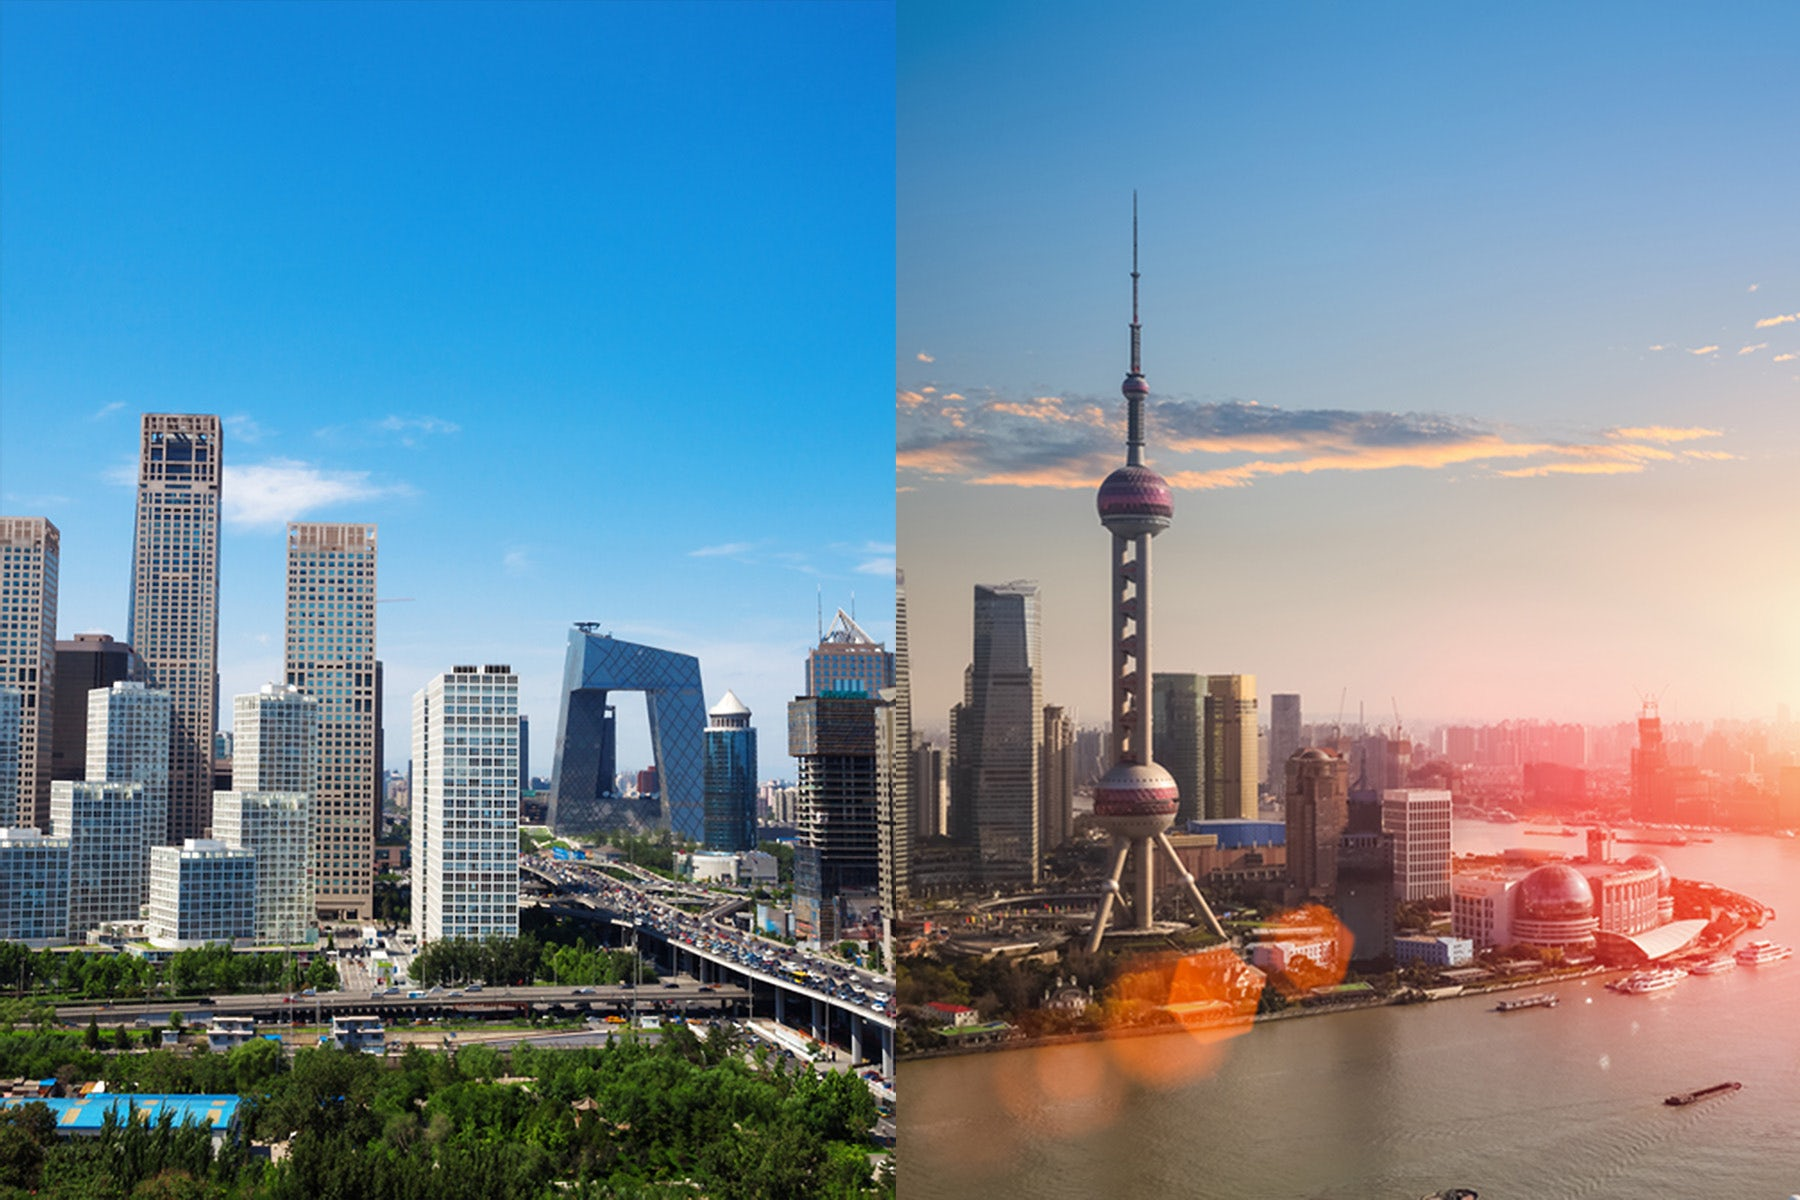 Beijing (L) and Shanghai (R) skylines | Source: Shutterstock